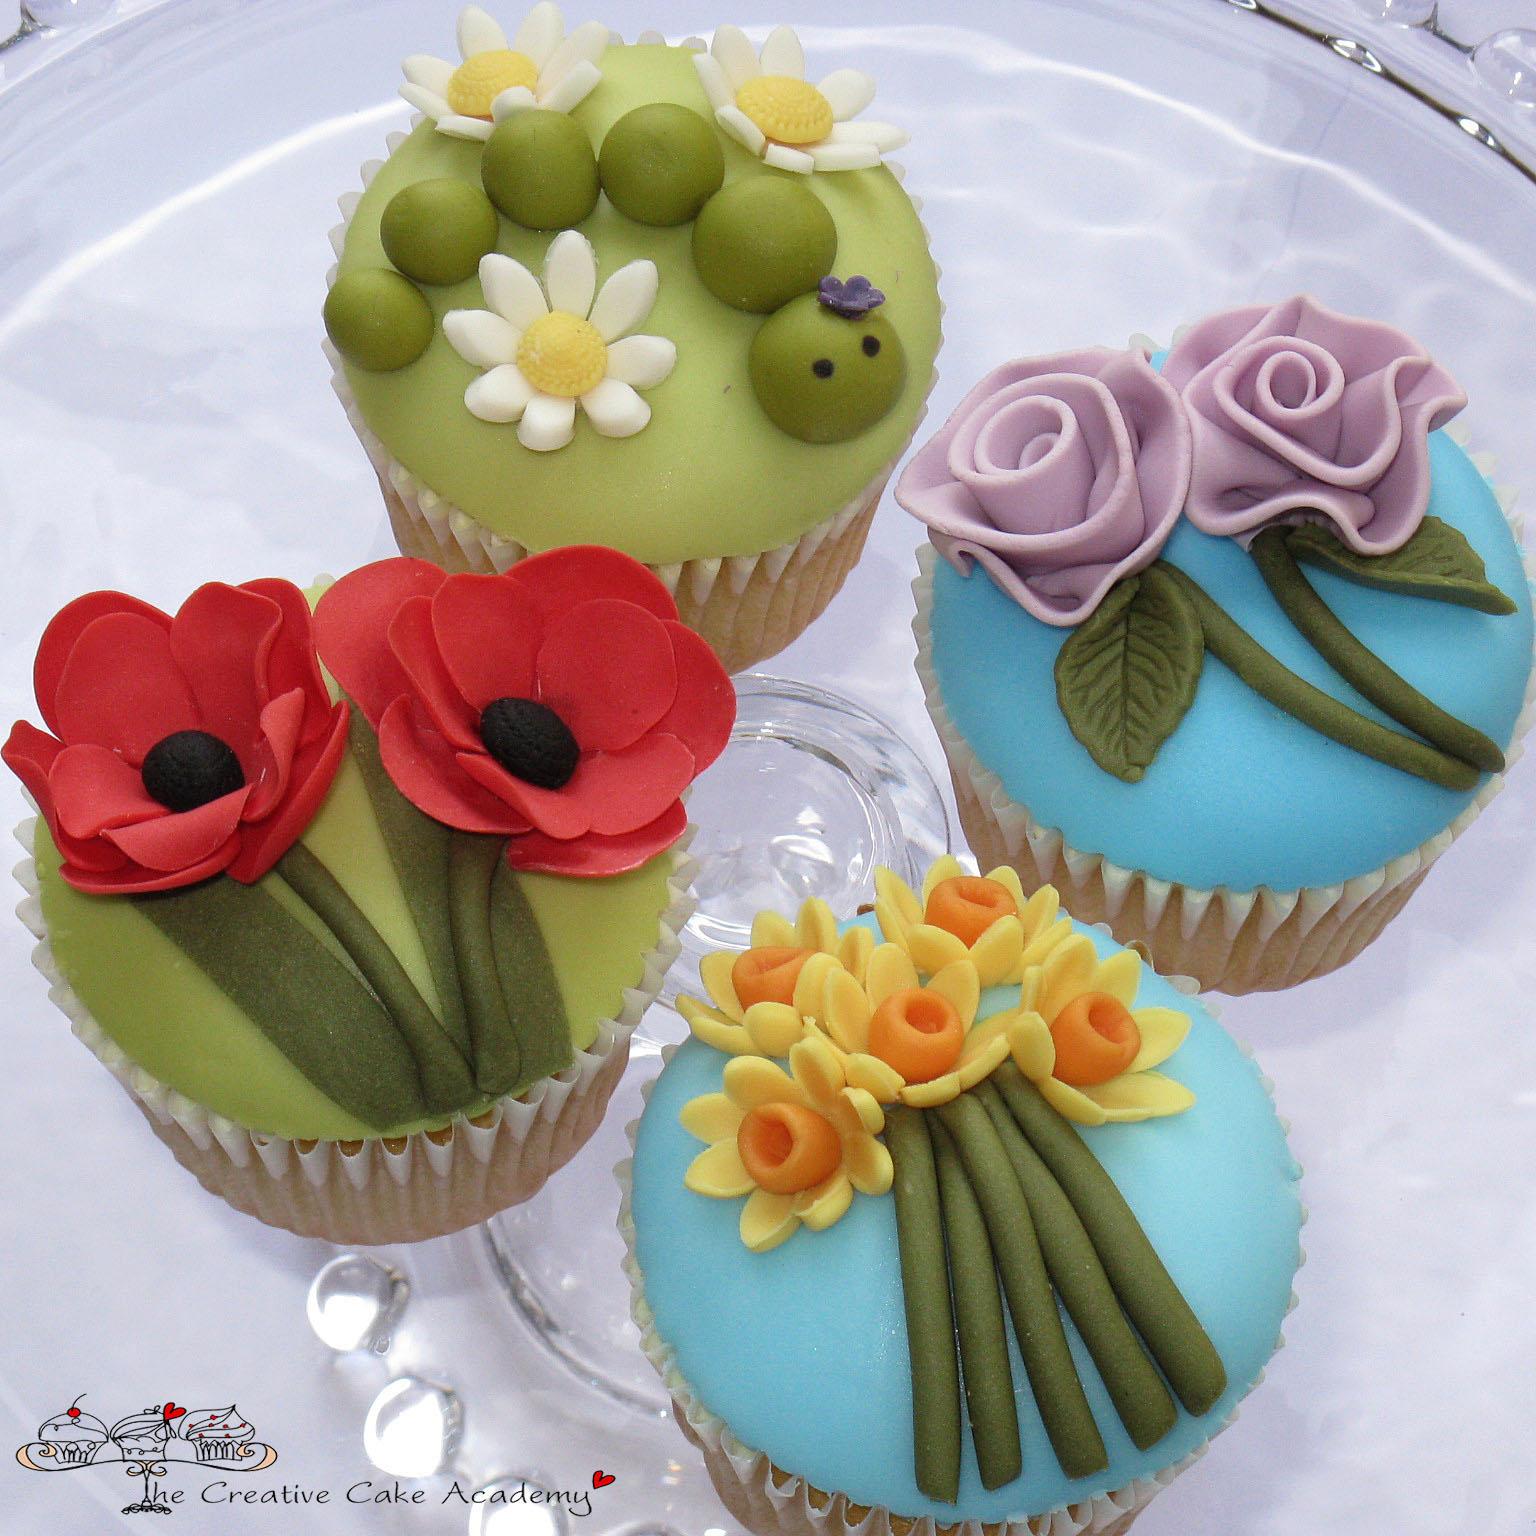 Cake Decorating Course Northumberland : Garden Cake Decorations